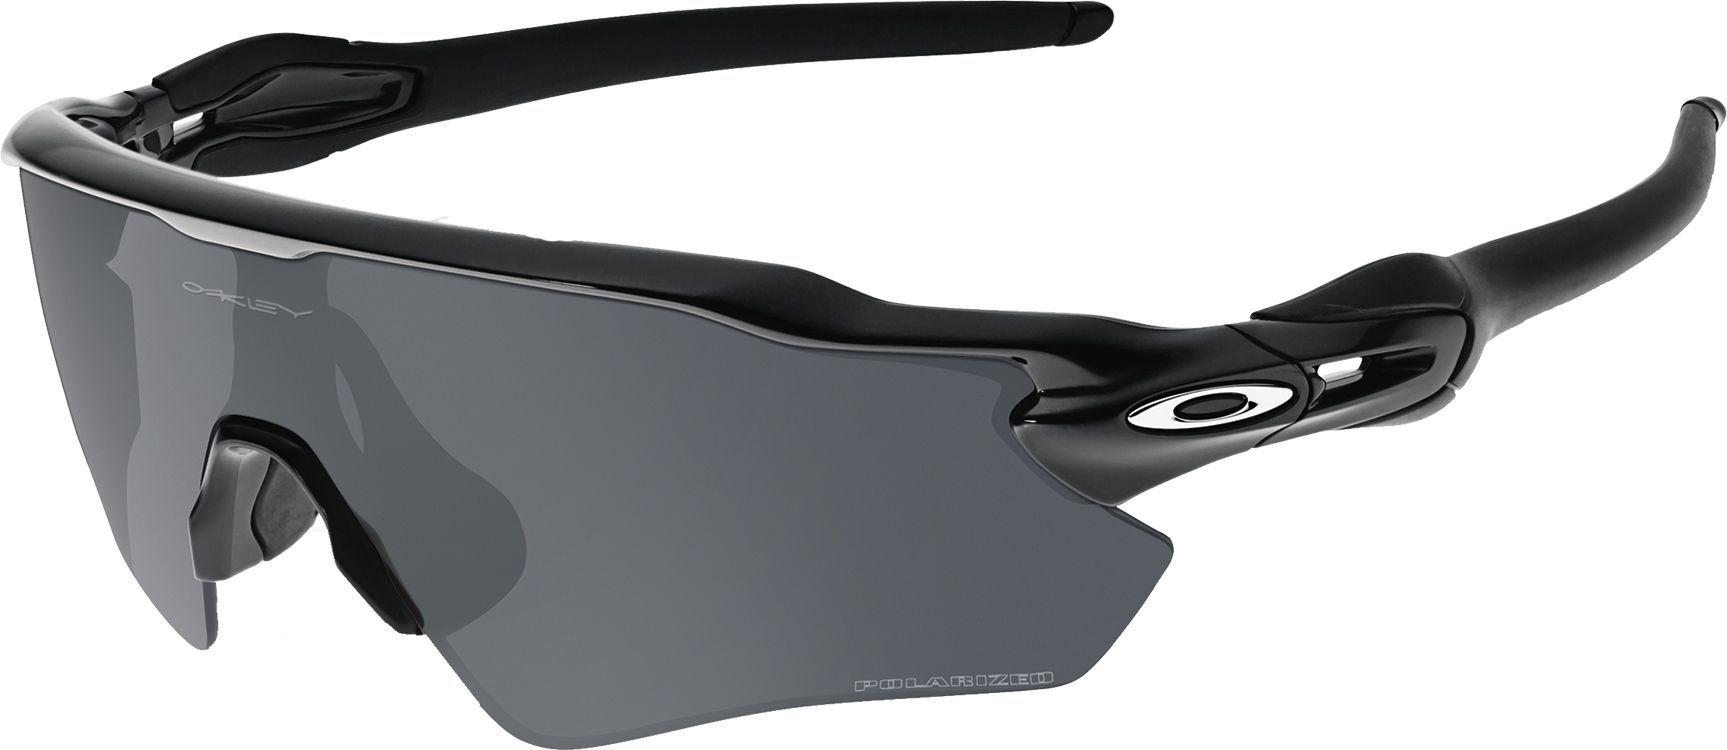 7356f2b198 Oakley Men s Radar EV Path Polarized Sunglasses